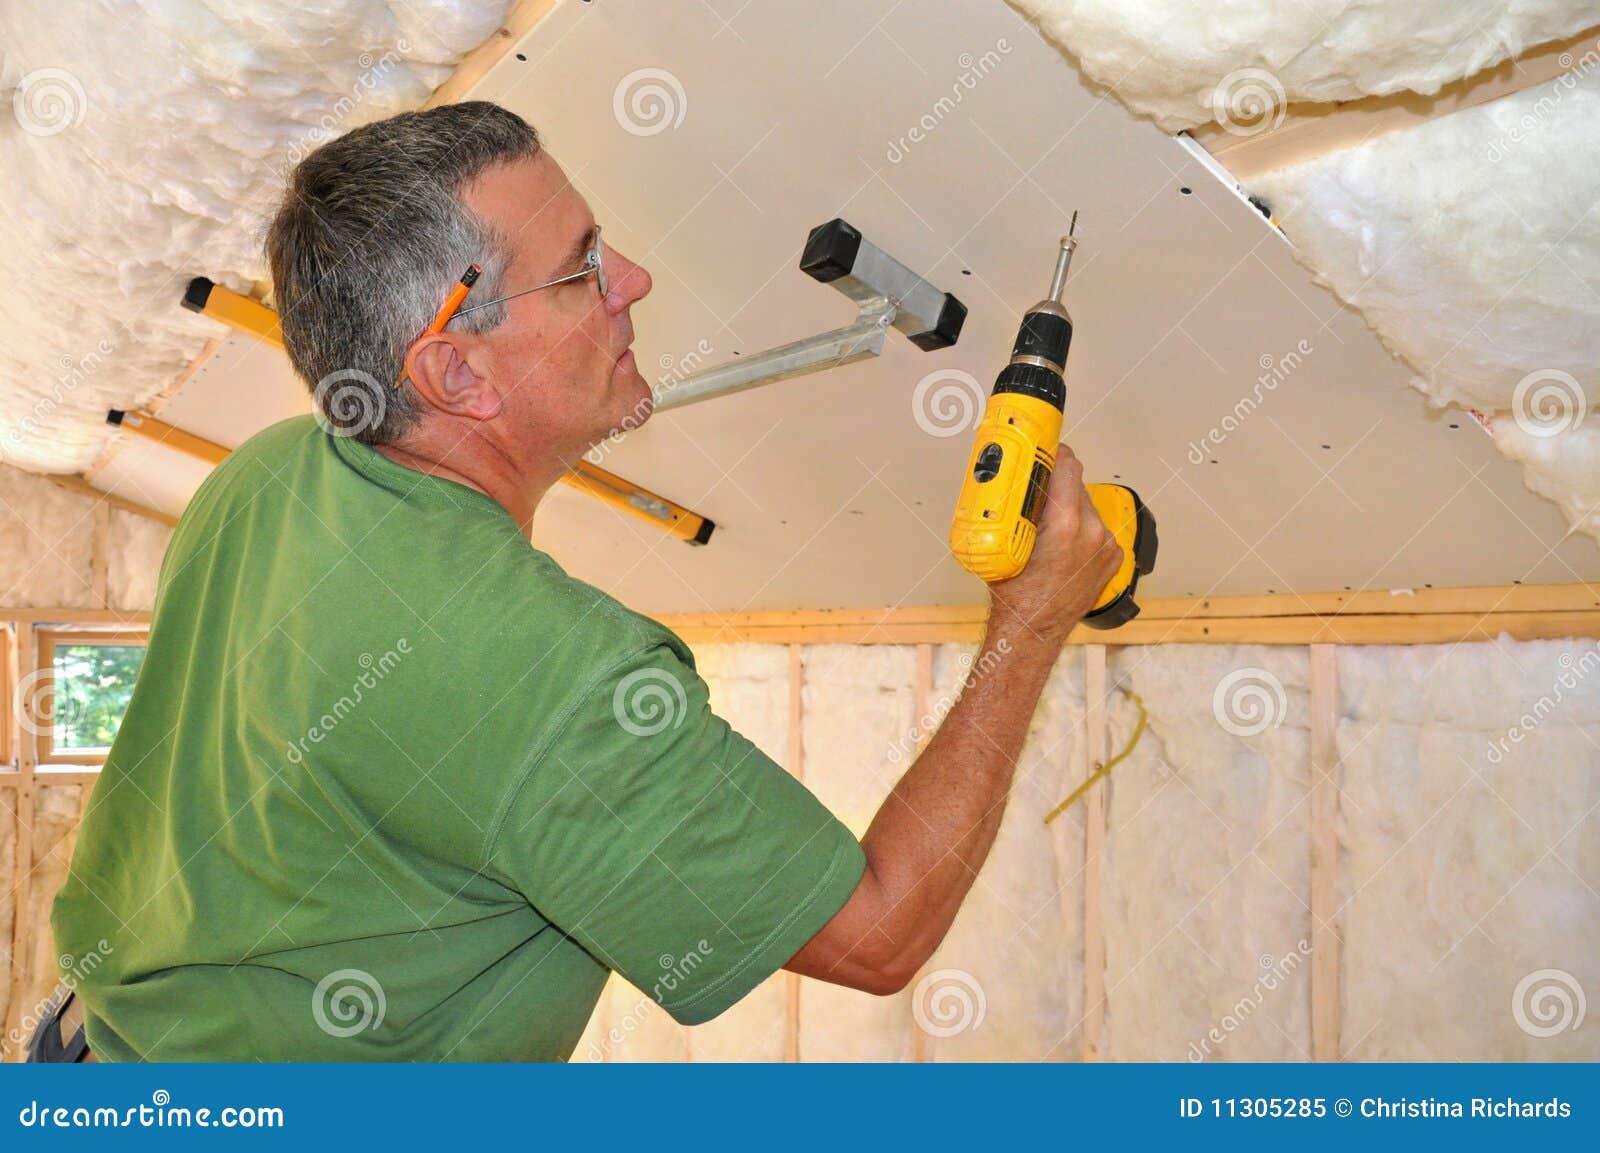 Man installing drywall on ceiling